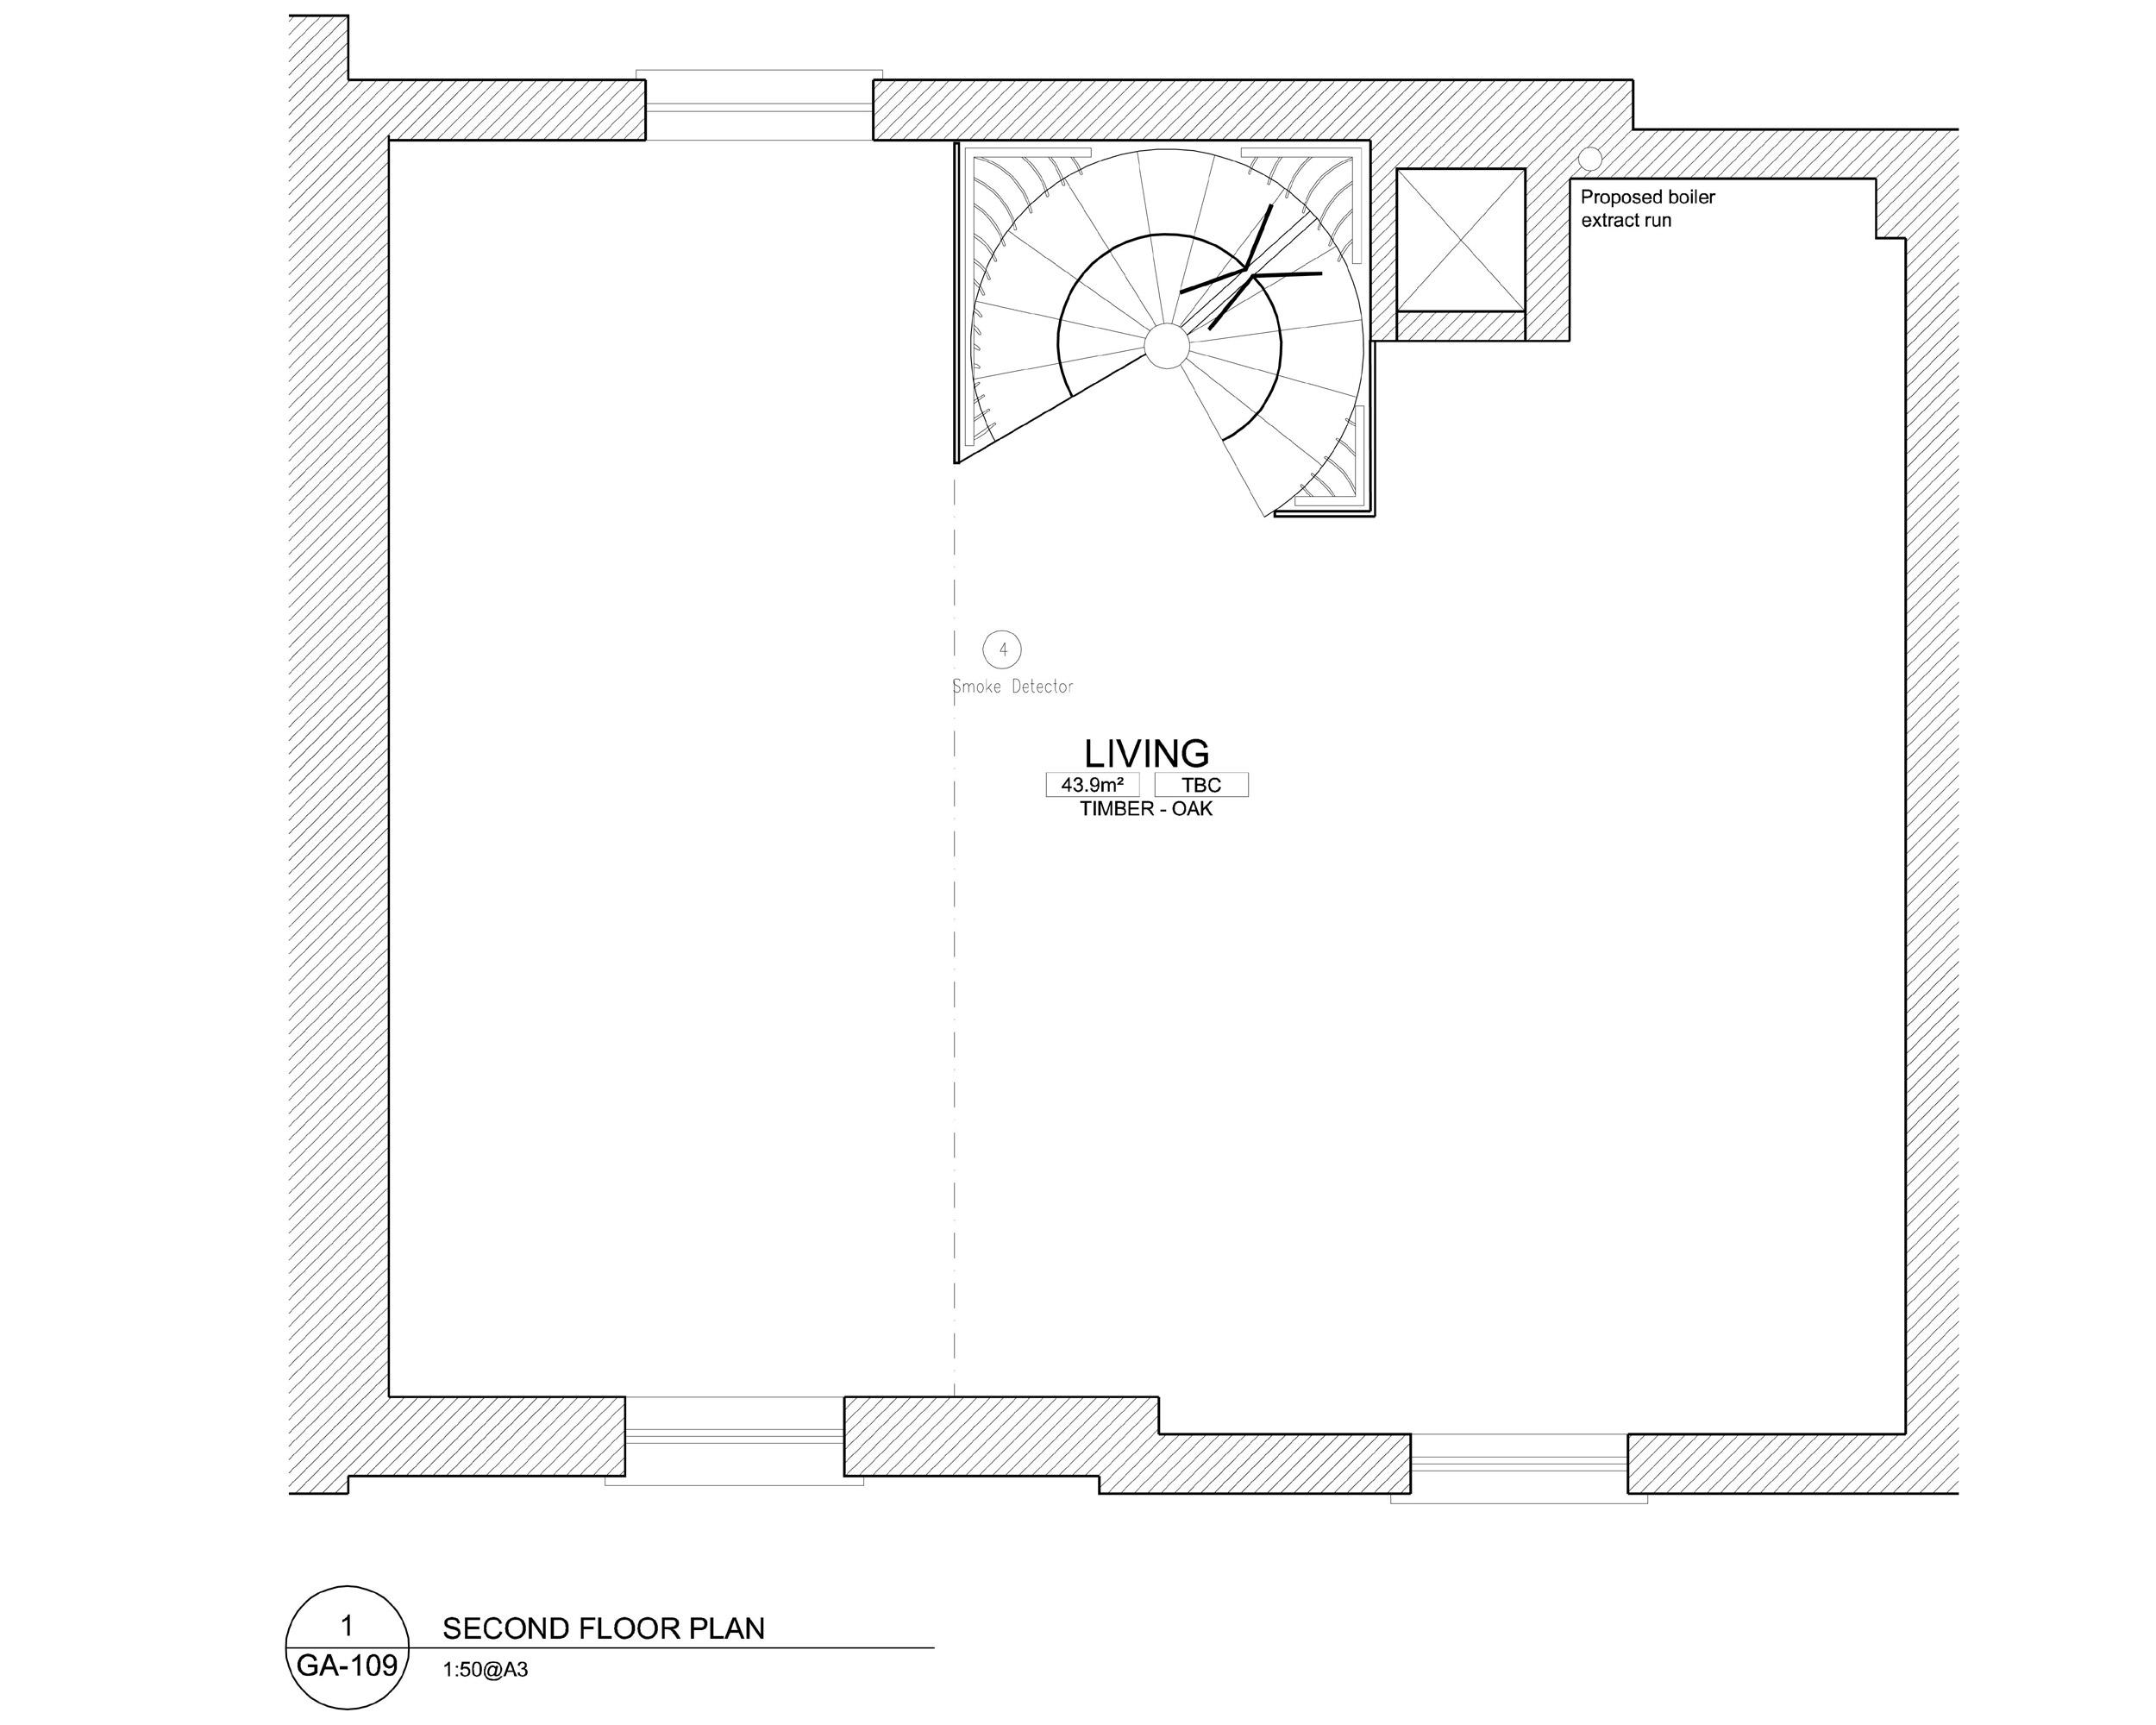 Floor plans for Ladbroke Road